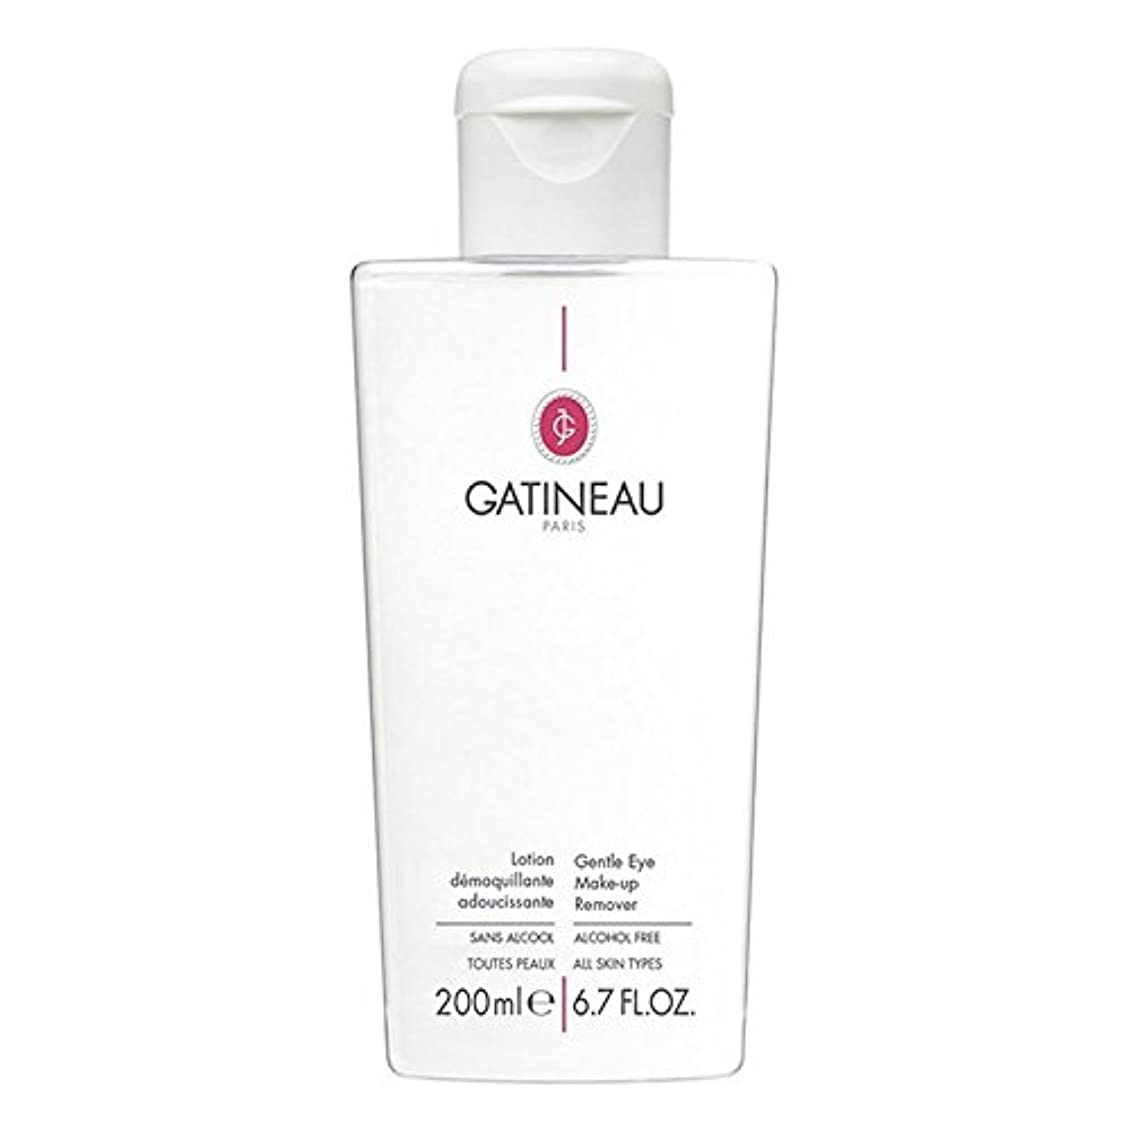 Gatineau Gentle Eye Makeup Remover 200ml - ガティノー優しいアイメイクリムーバー200ミリリットル [並行輸入品]